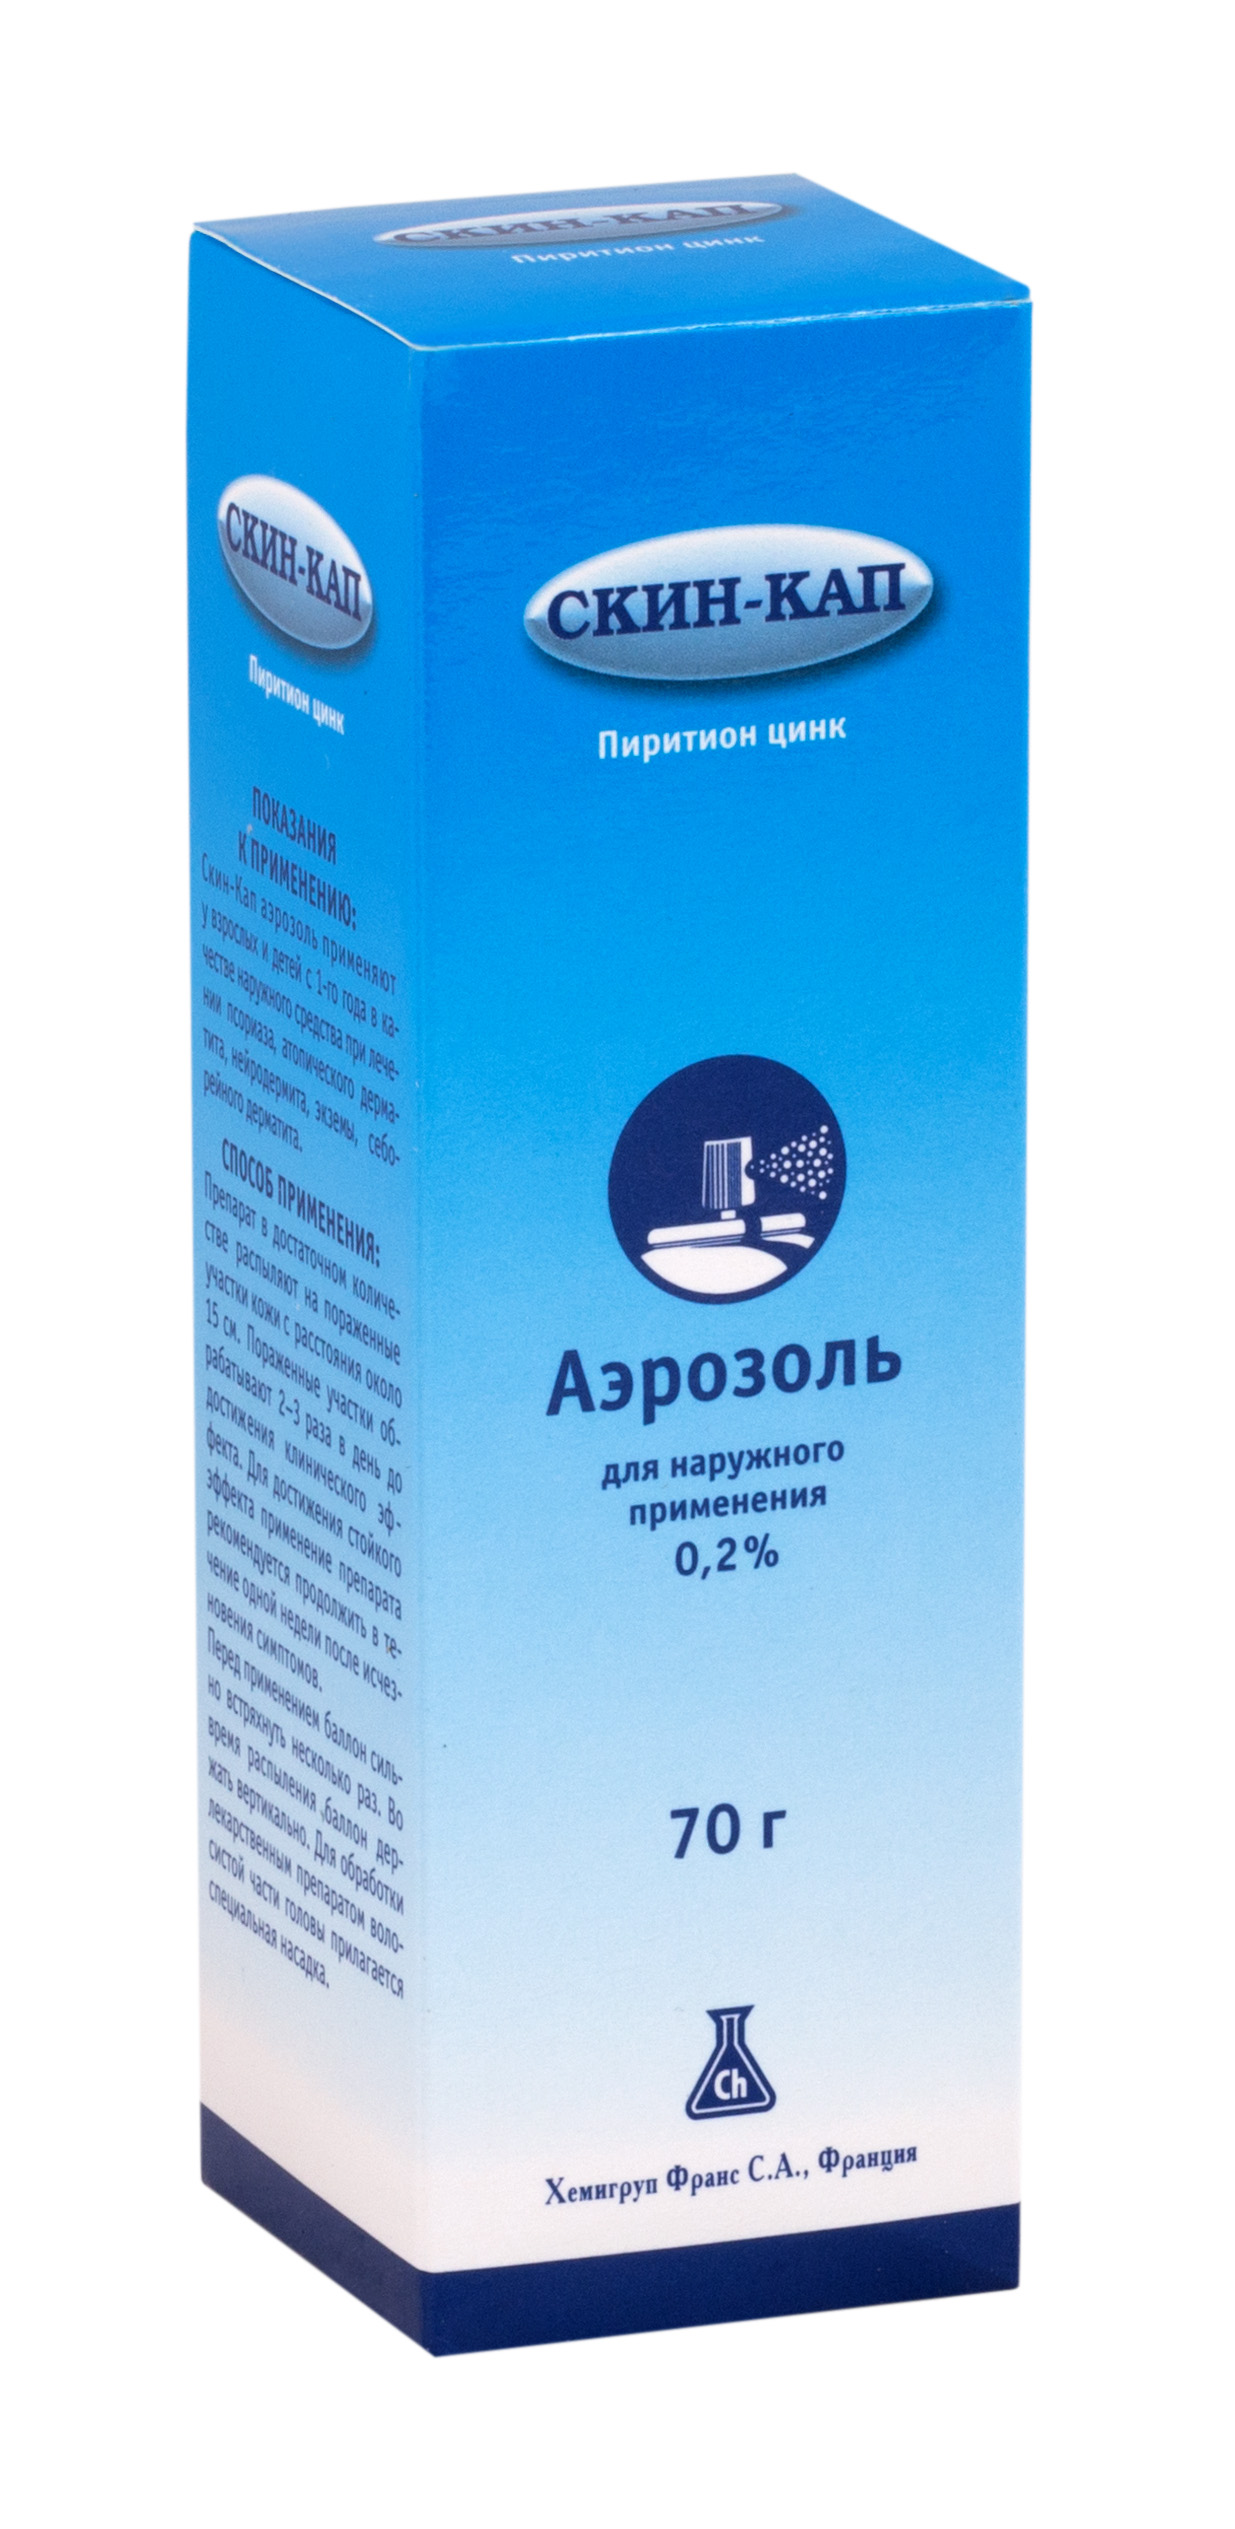 Скин-кап аэроз. наружн. 0,2% 70г/100мл